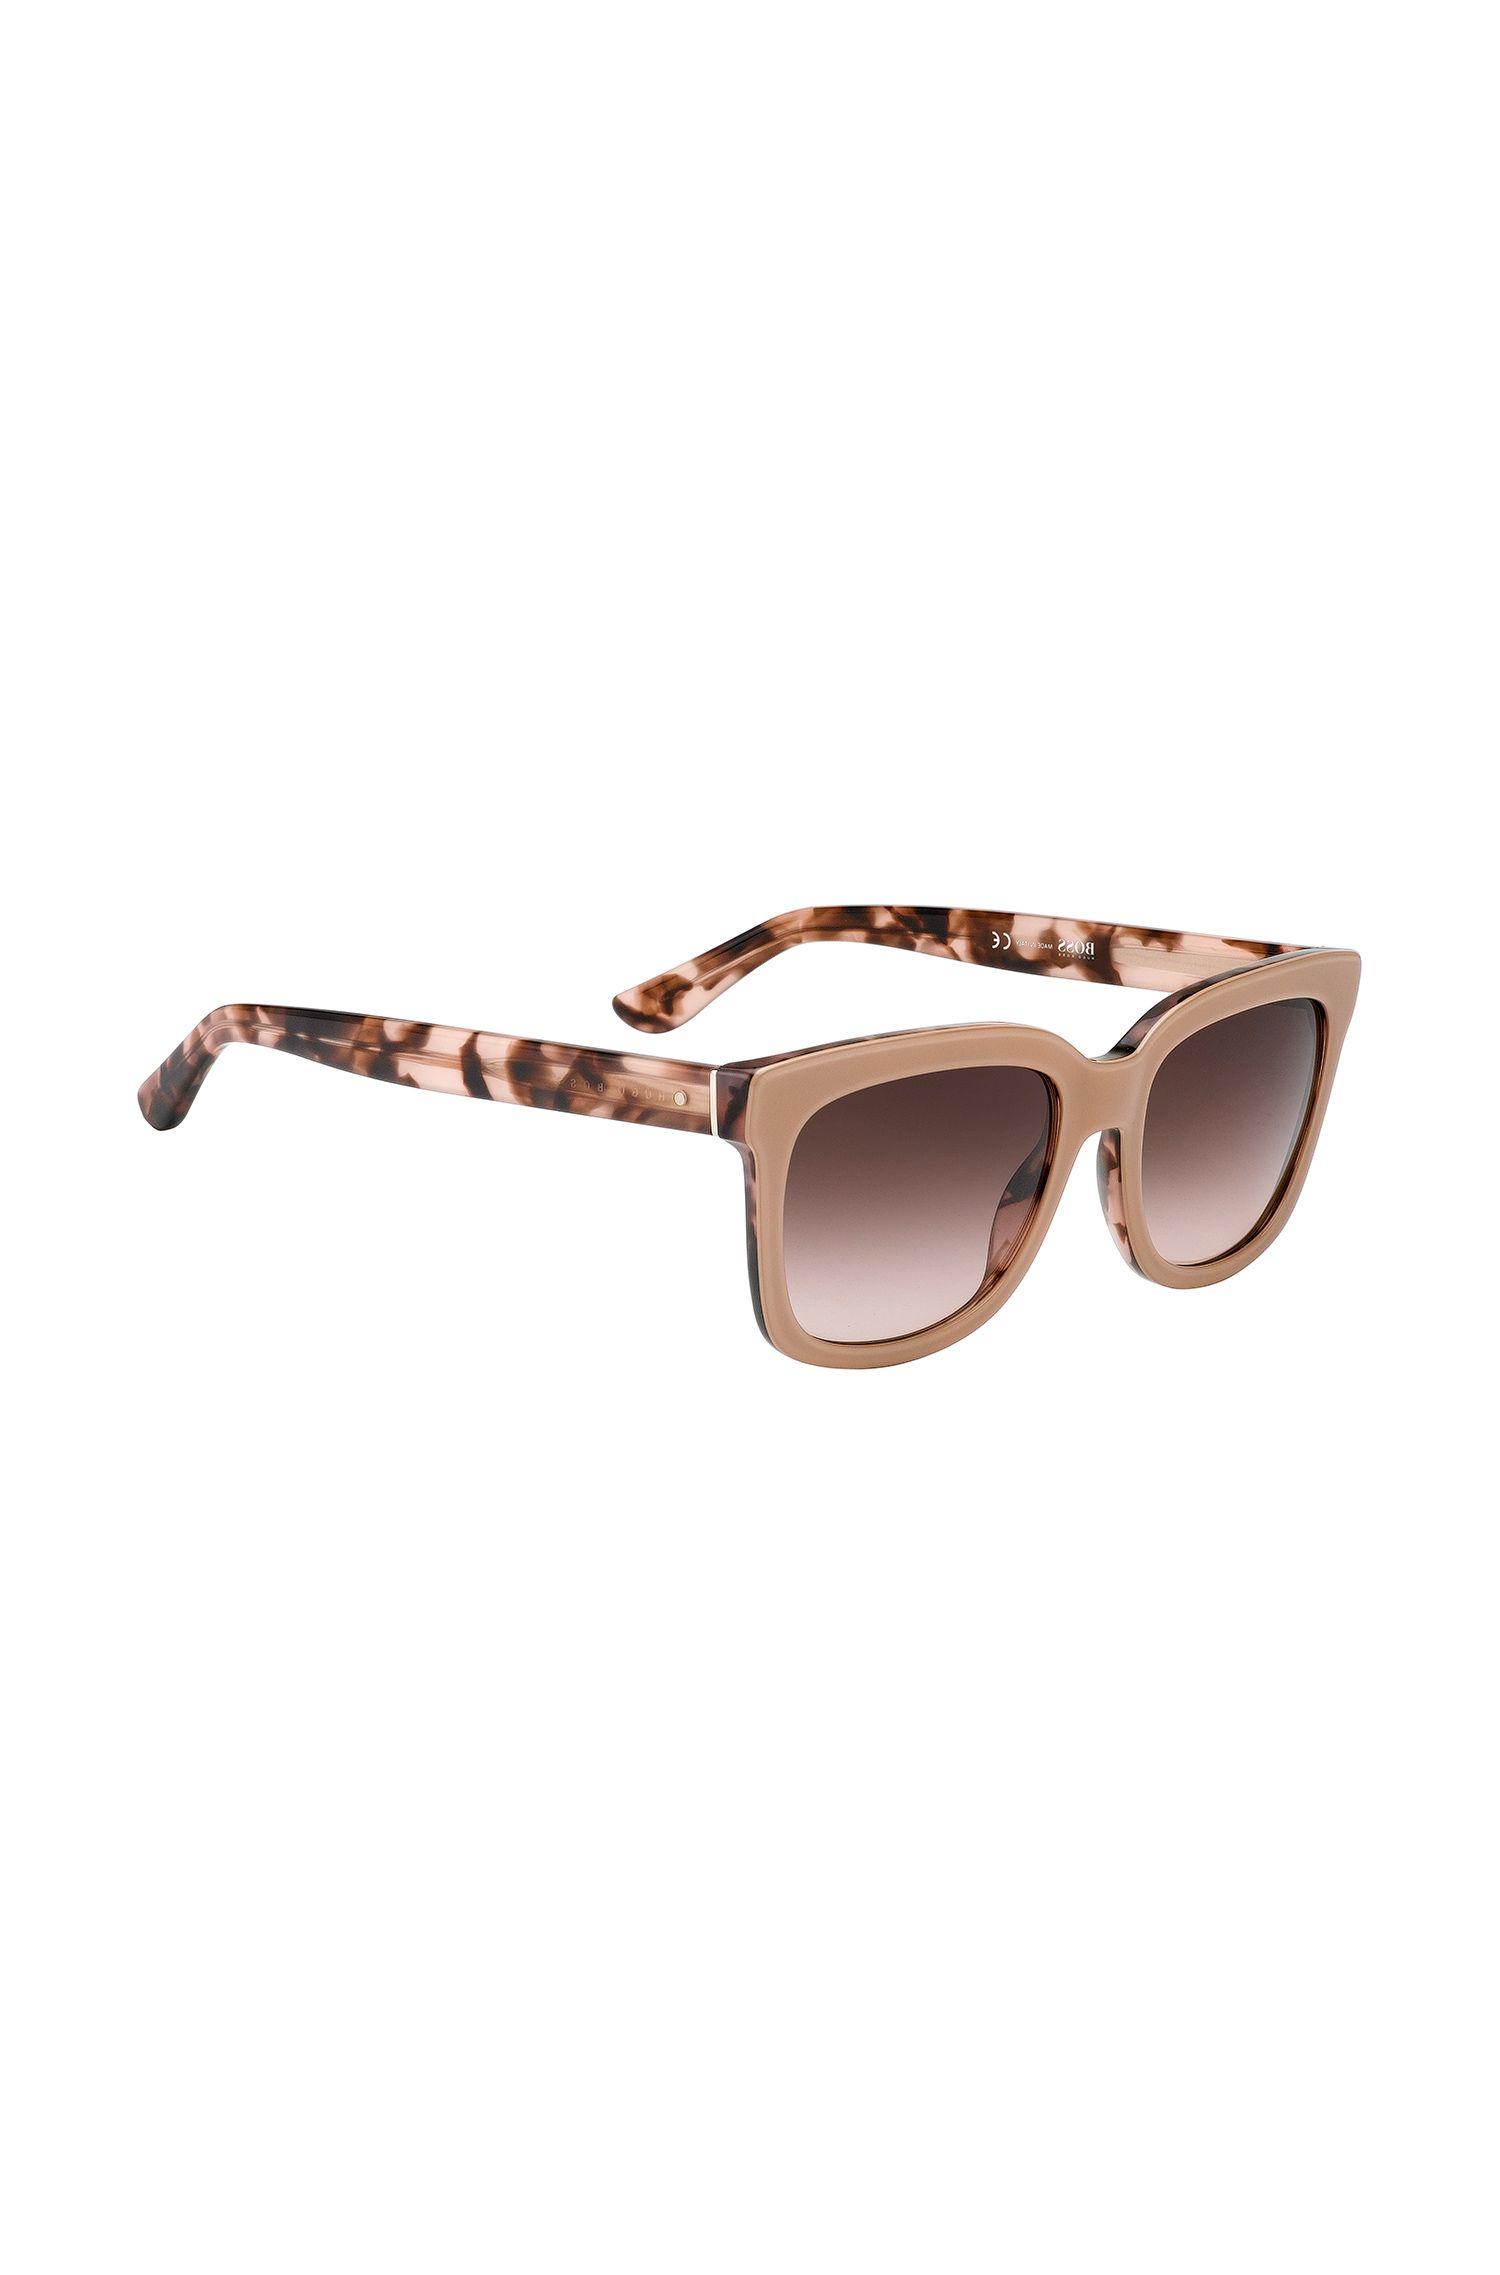 Gafas de sol: 'BOSS 0741/S'